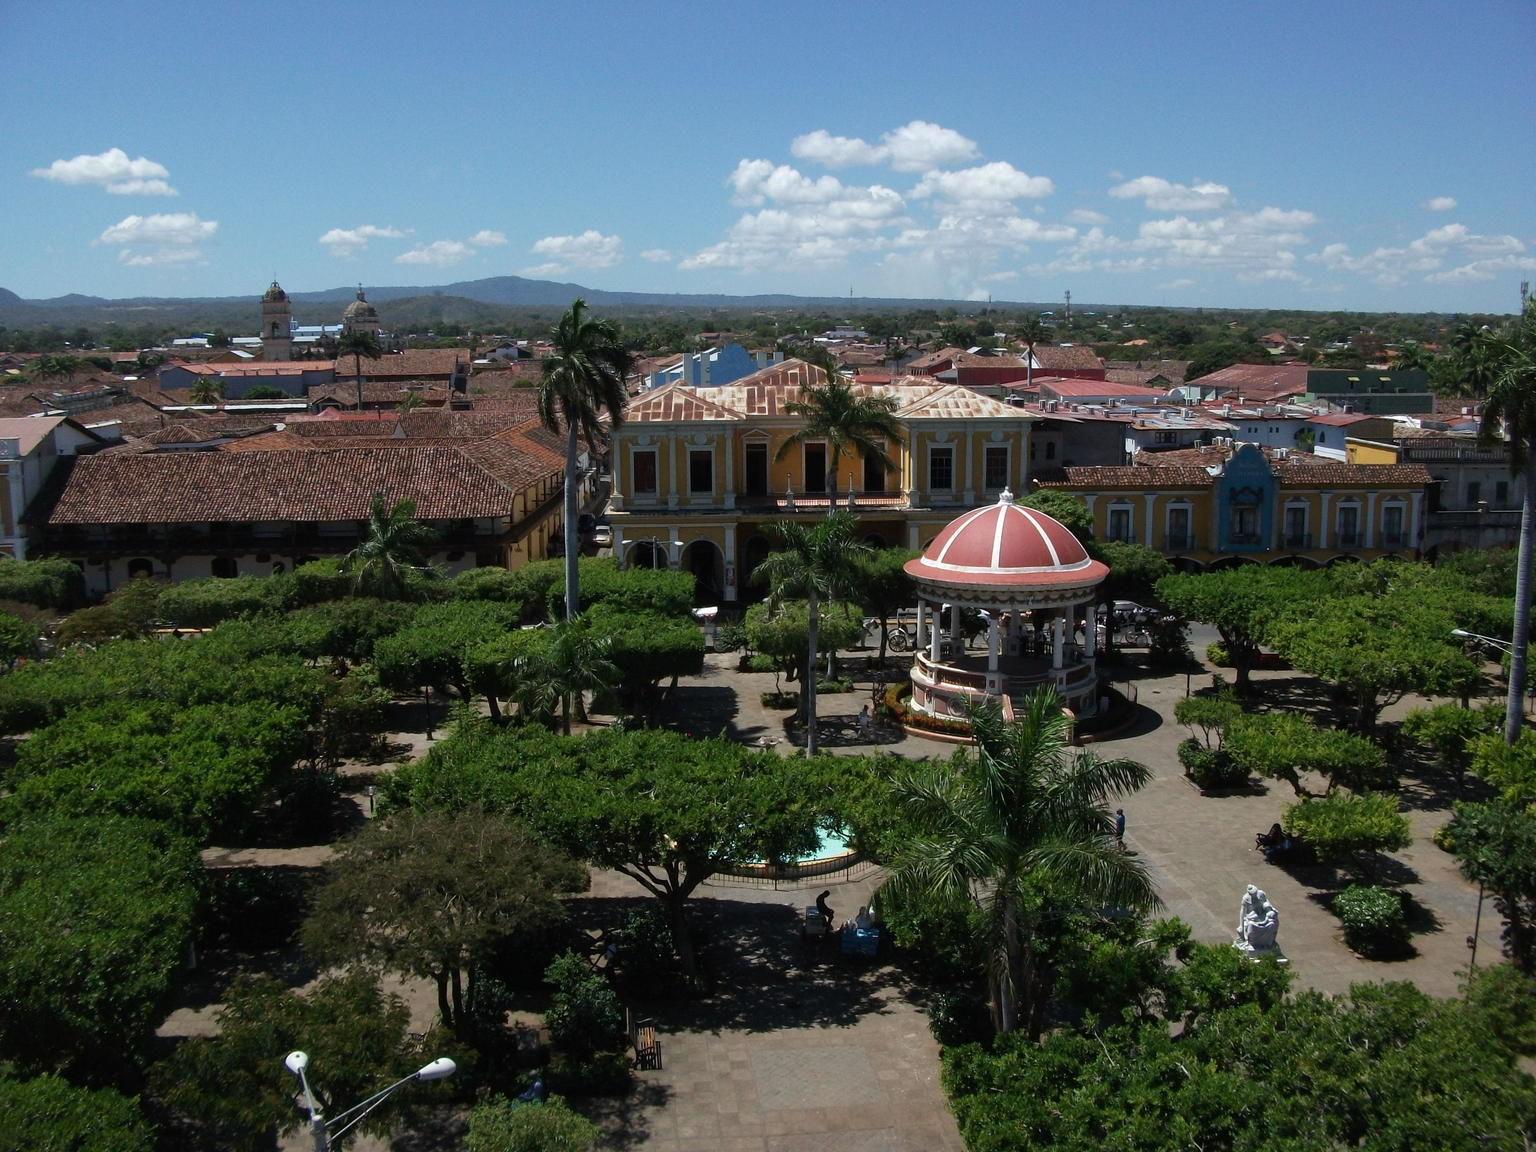 Day Trip to Granada, Masaya and Catarina from Managua